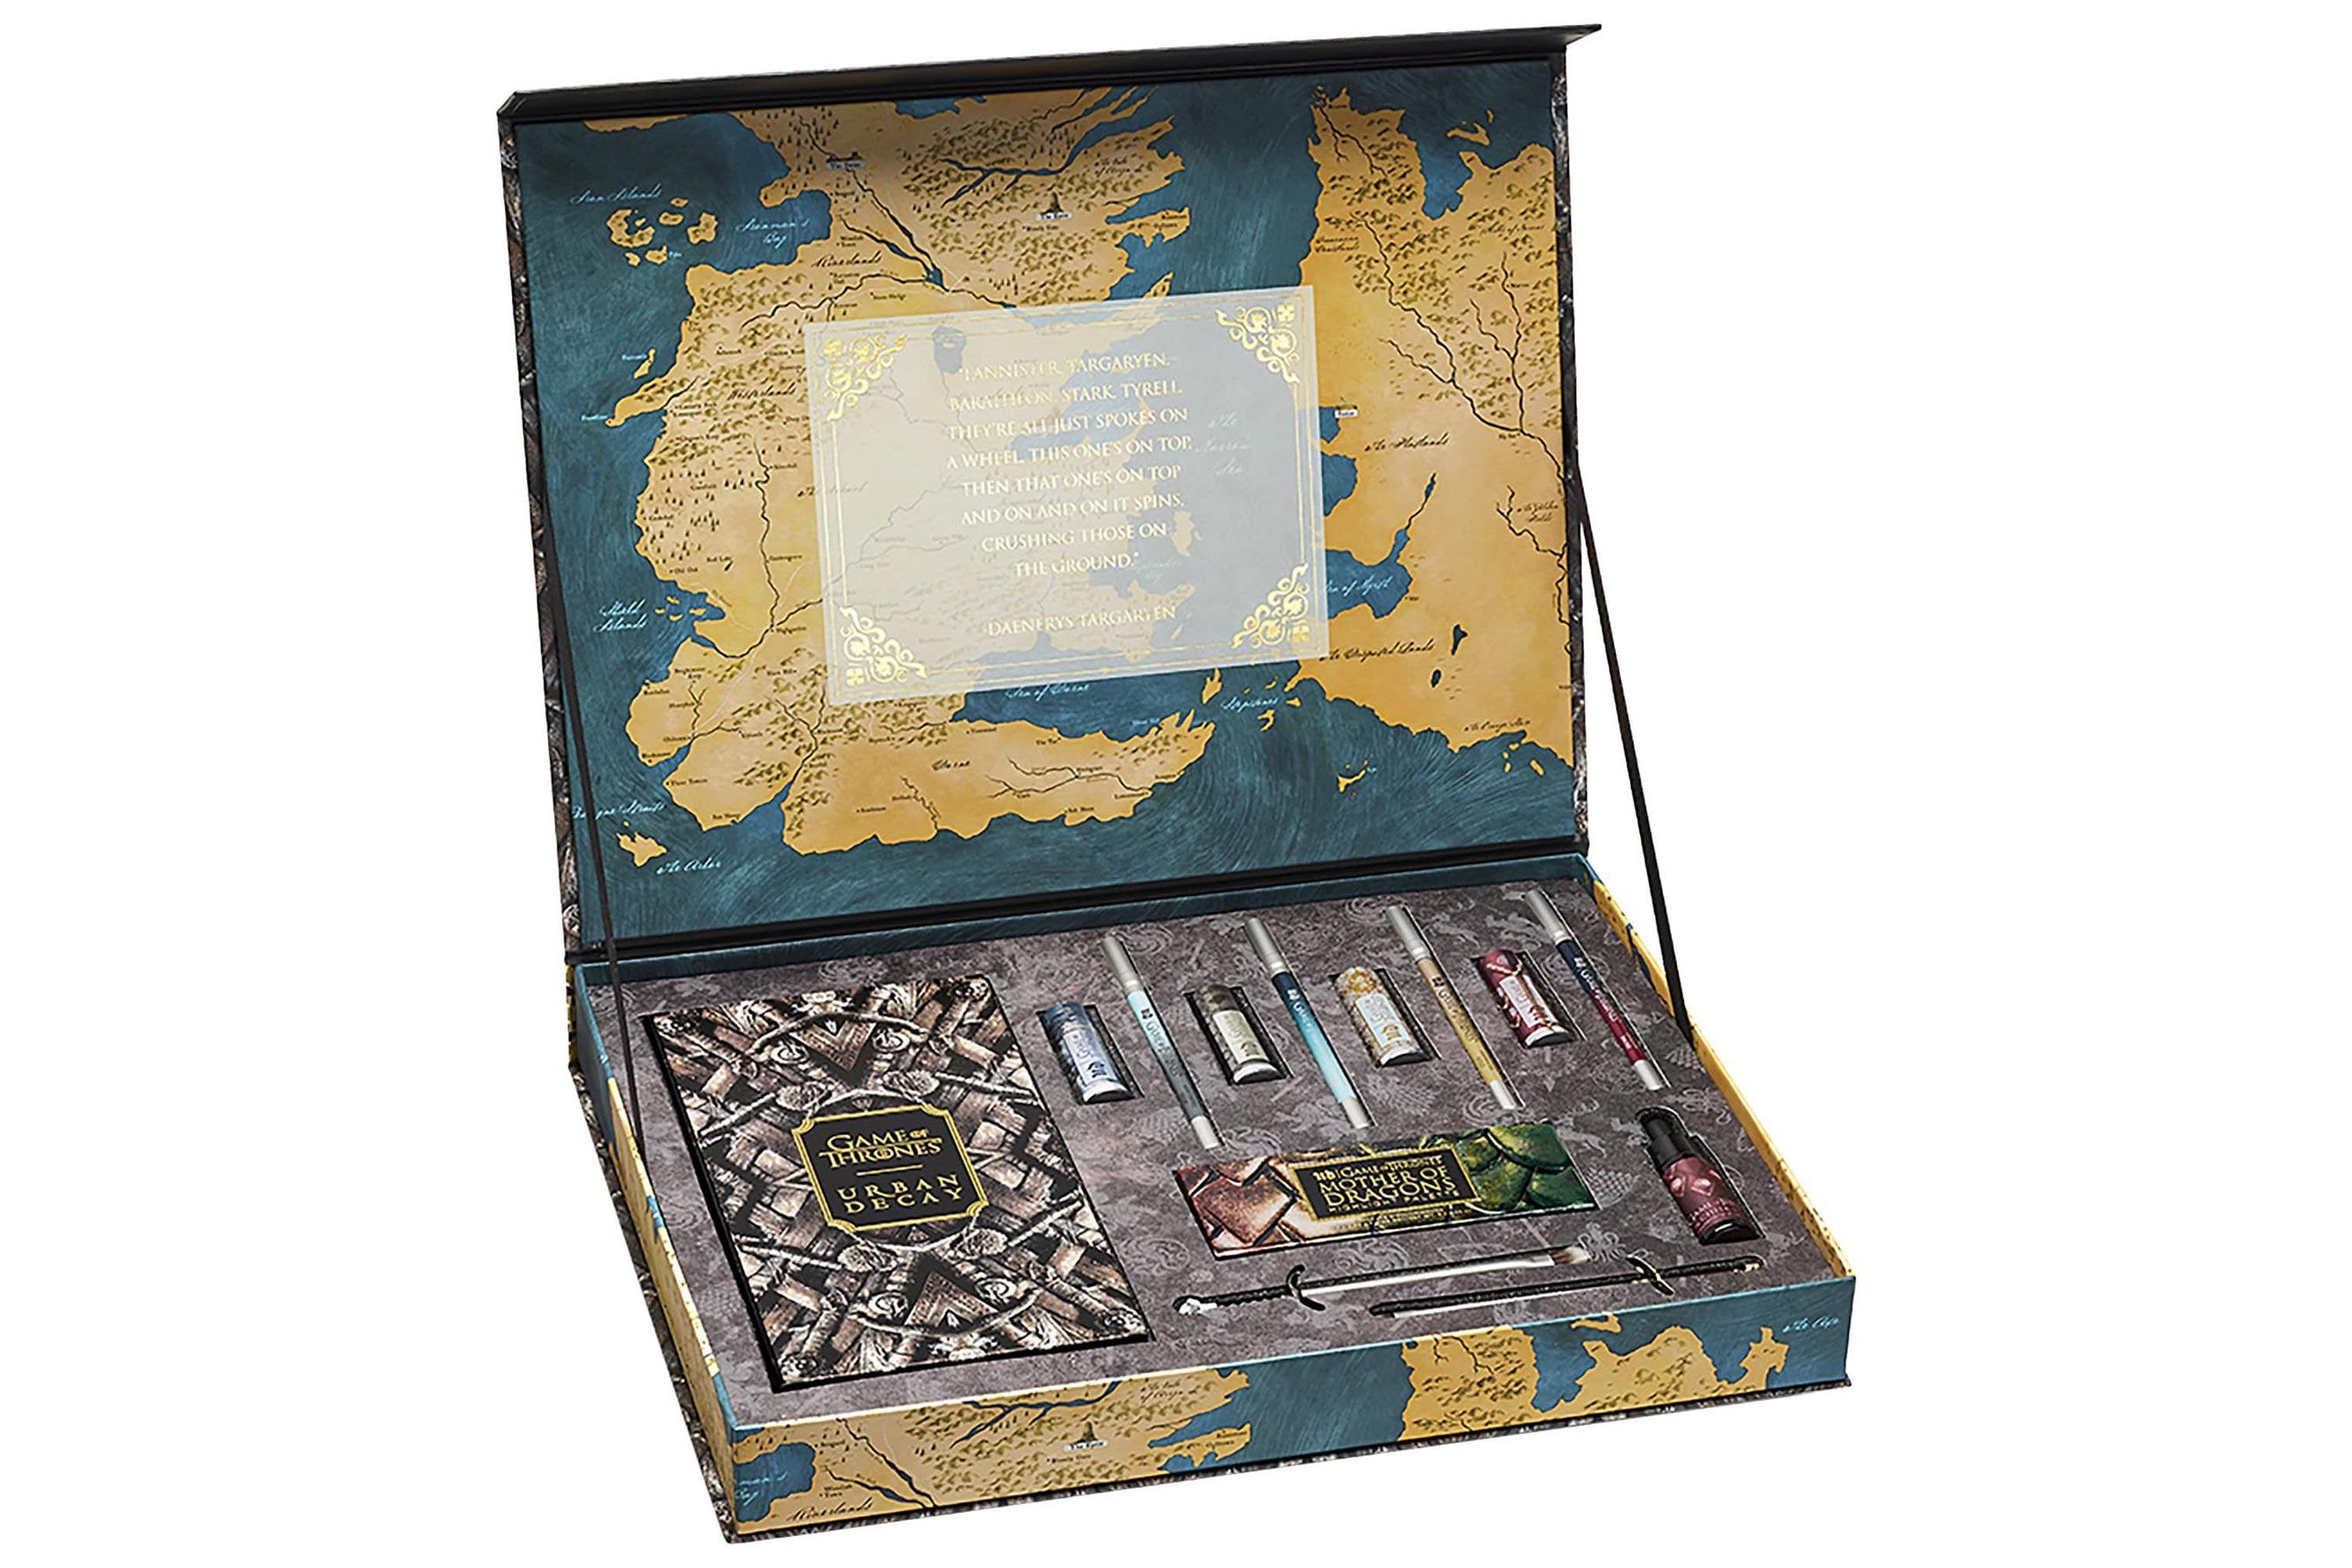 Spiksplinternieuw 11 of the best Game of Thrones gifts for diehard fans GC-86